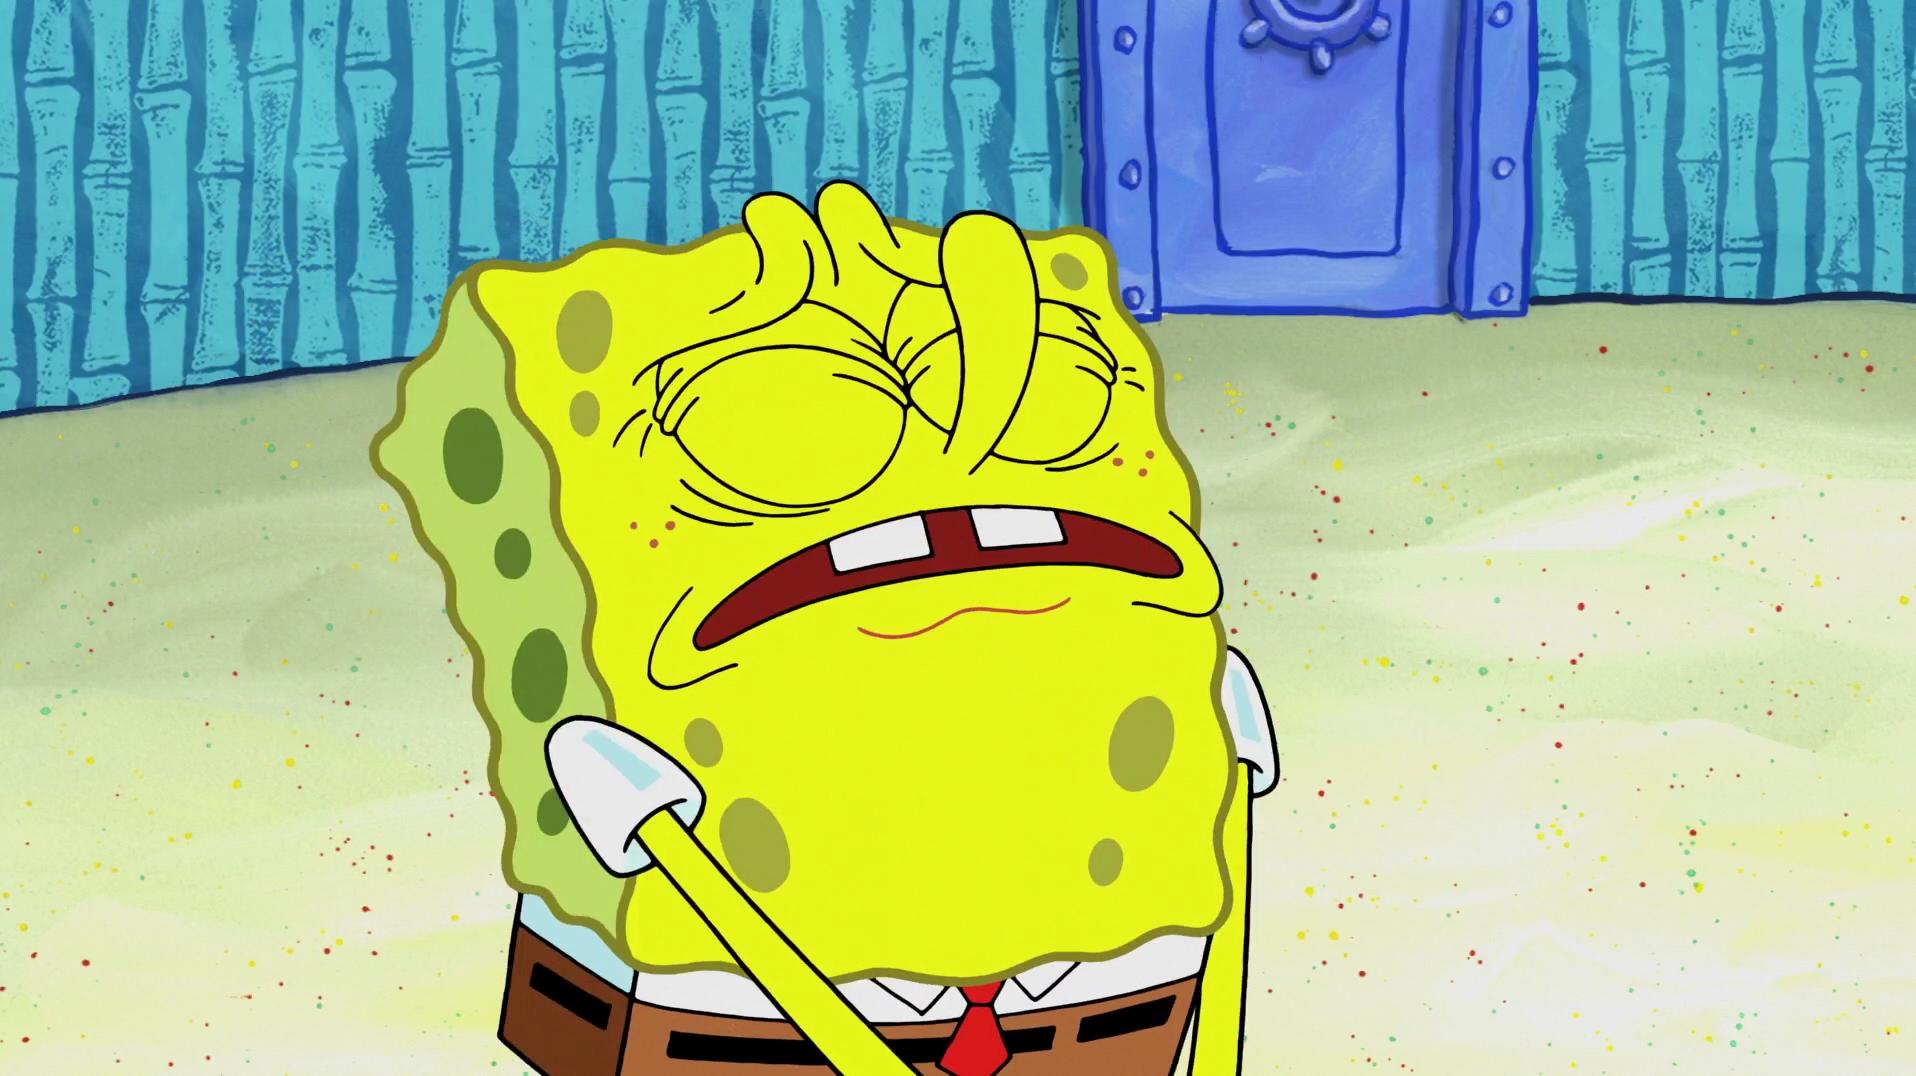 Spongebuddy mania spongebob episode the fish bowl for Spongebob characters fish